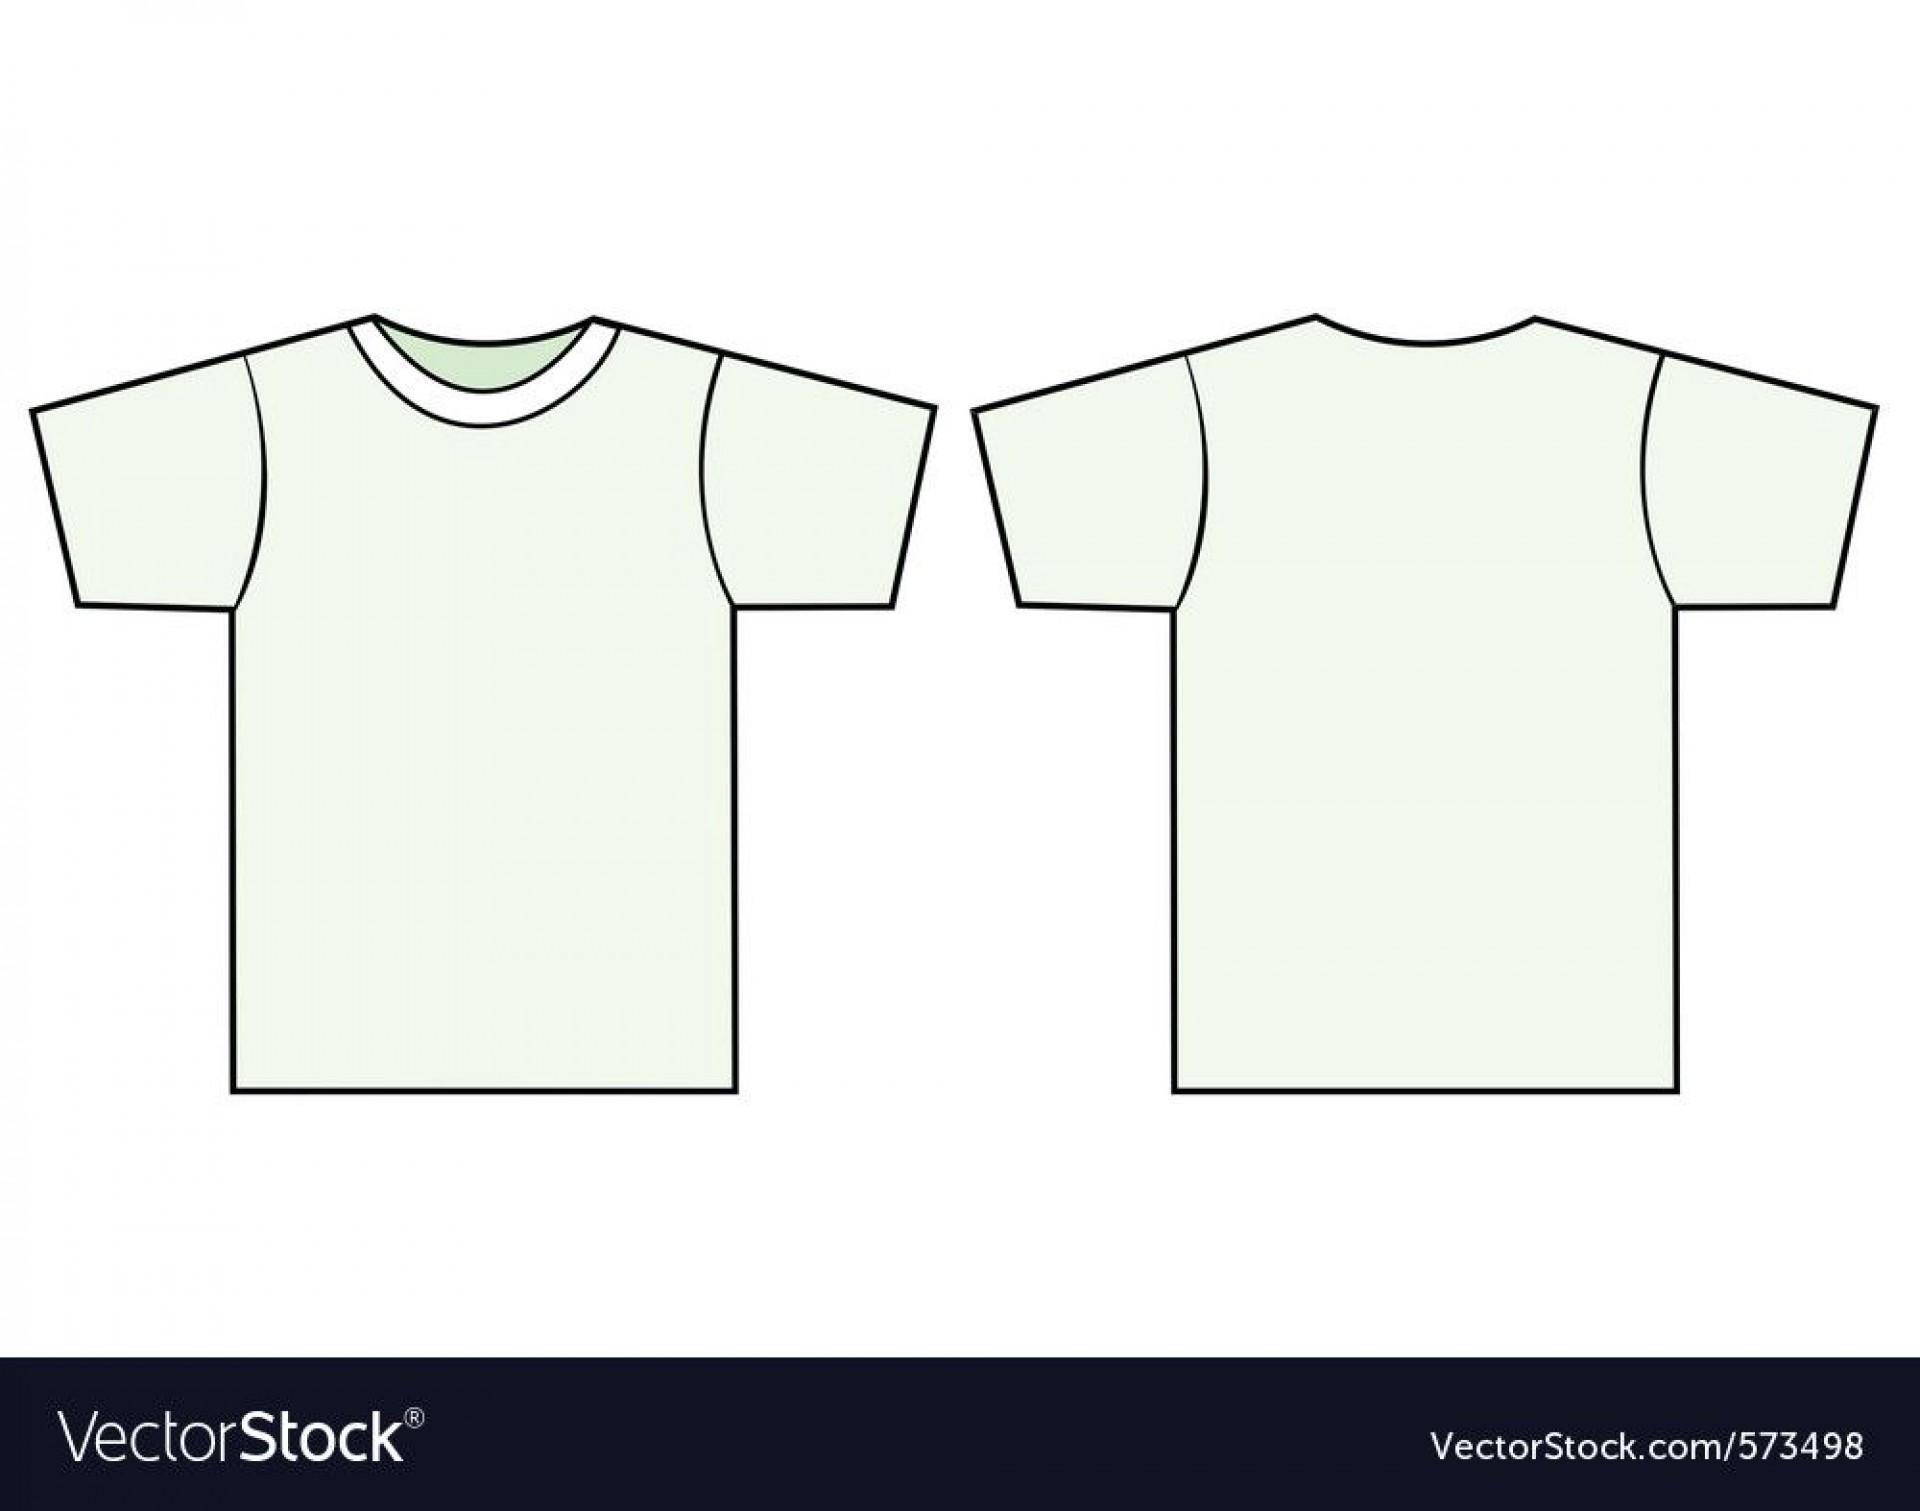 009 Impressive T Shirt Template Vector Idea  Black Front And Back Free Download Illustrator1920